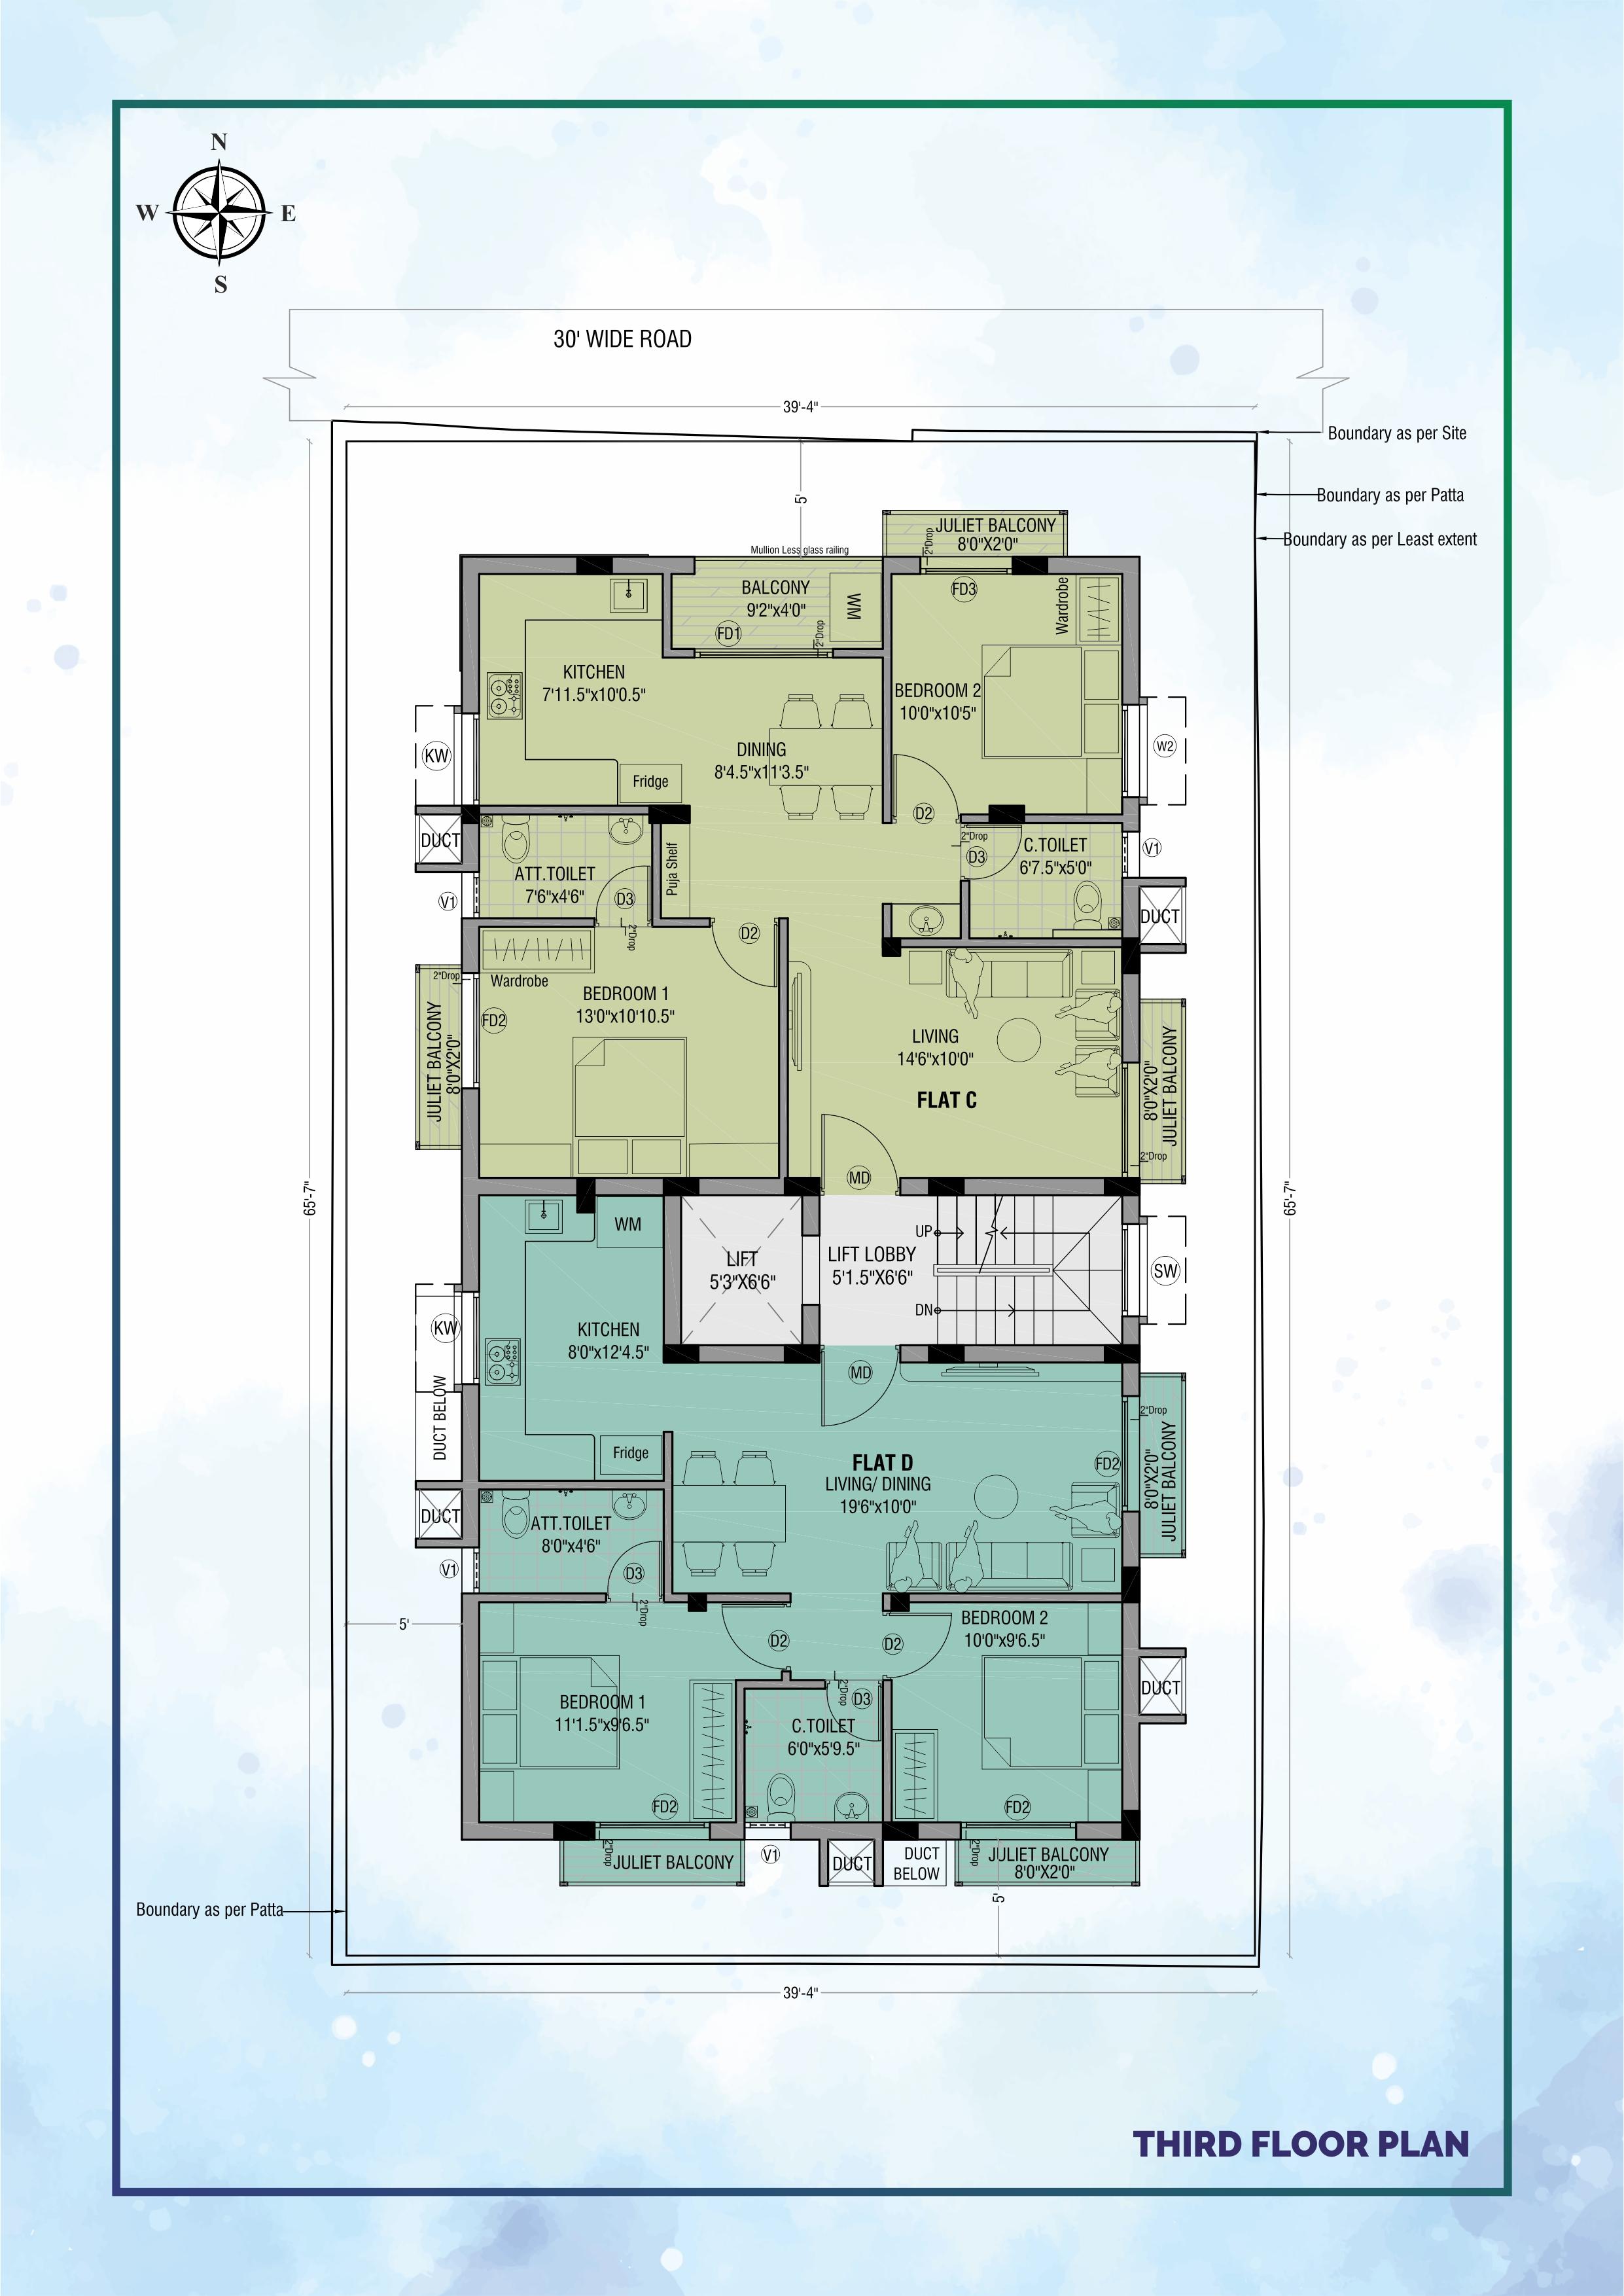 https://firmfoundations.in/projects/floorplans/thumbnails/16275382776Floor_Plan.jpg